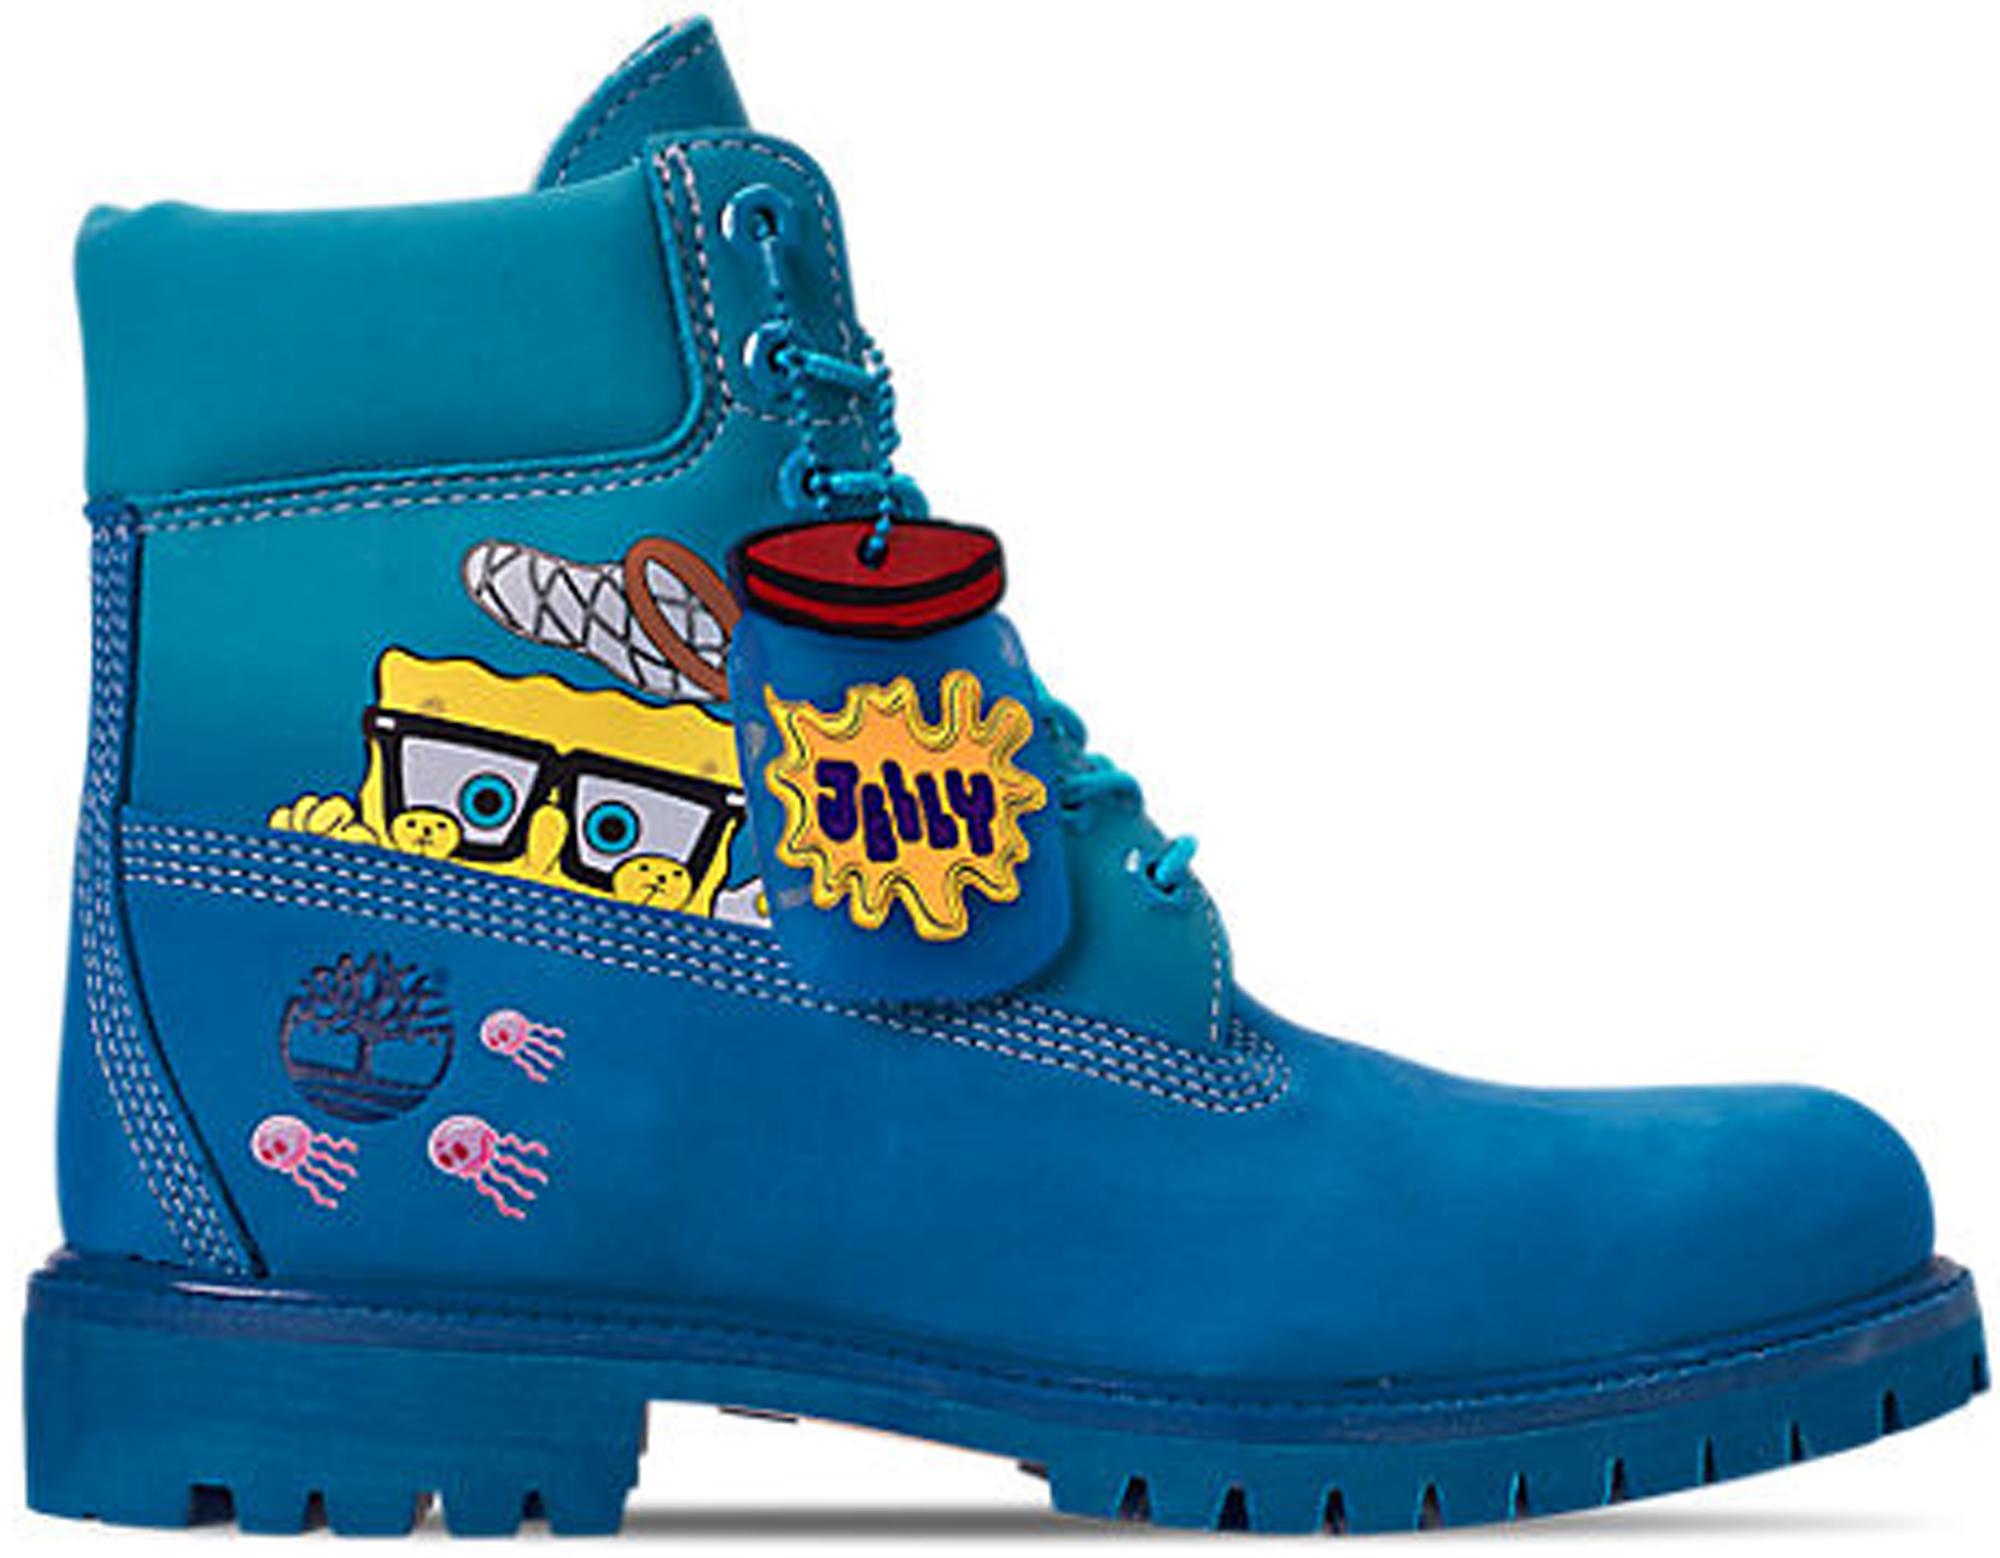 Spongebob Blue • Buy or Sell on StockX